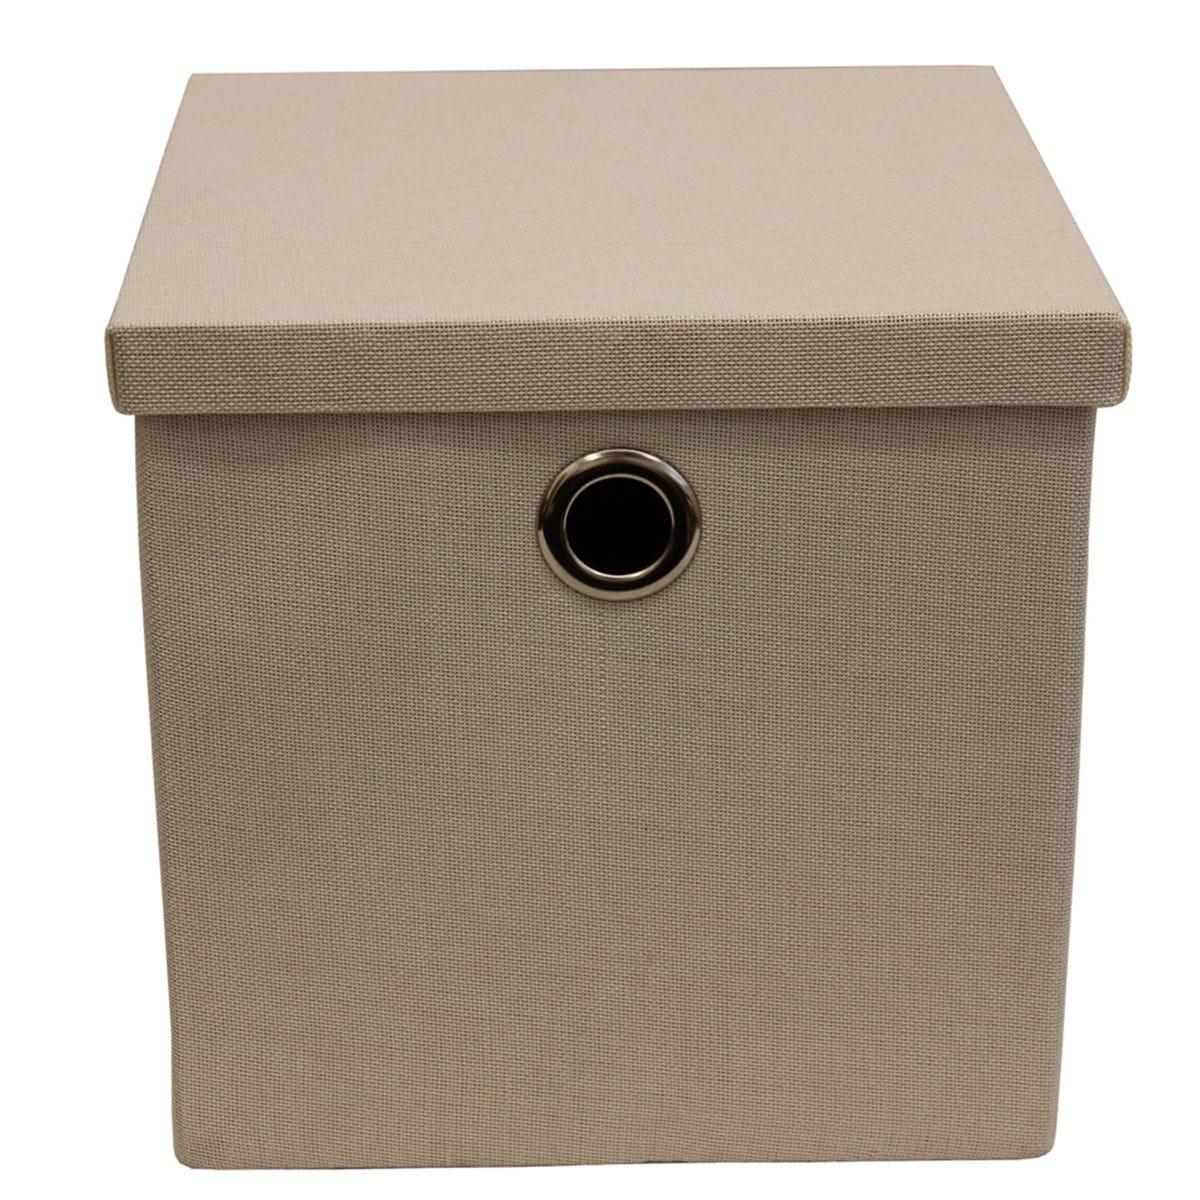 JVL Foldable Storage Box With Chrome Handles - Cream